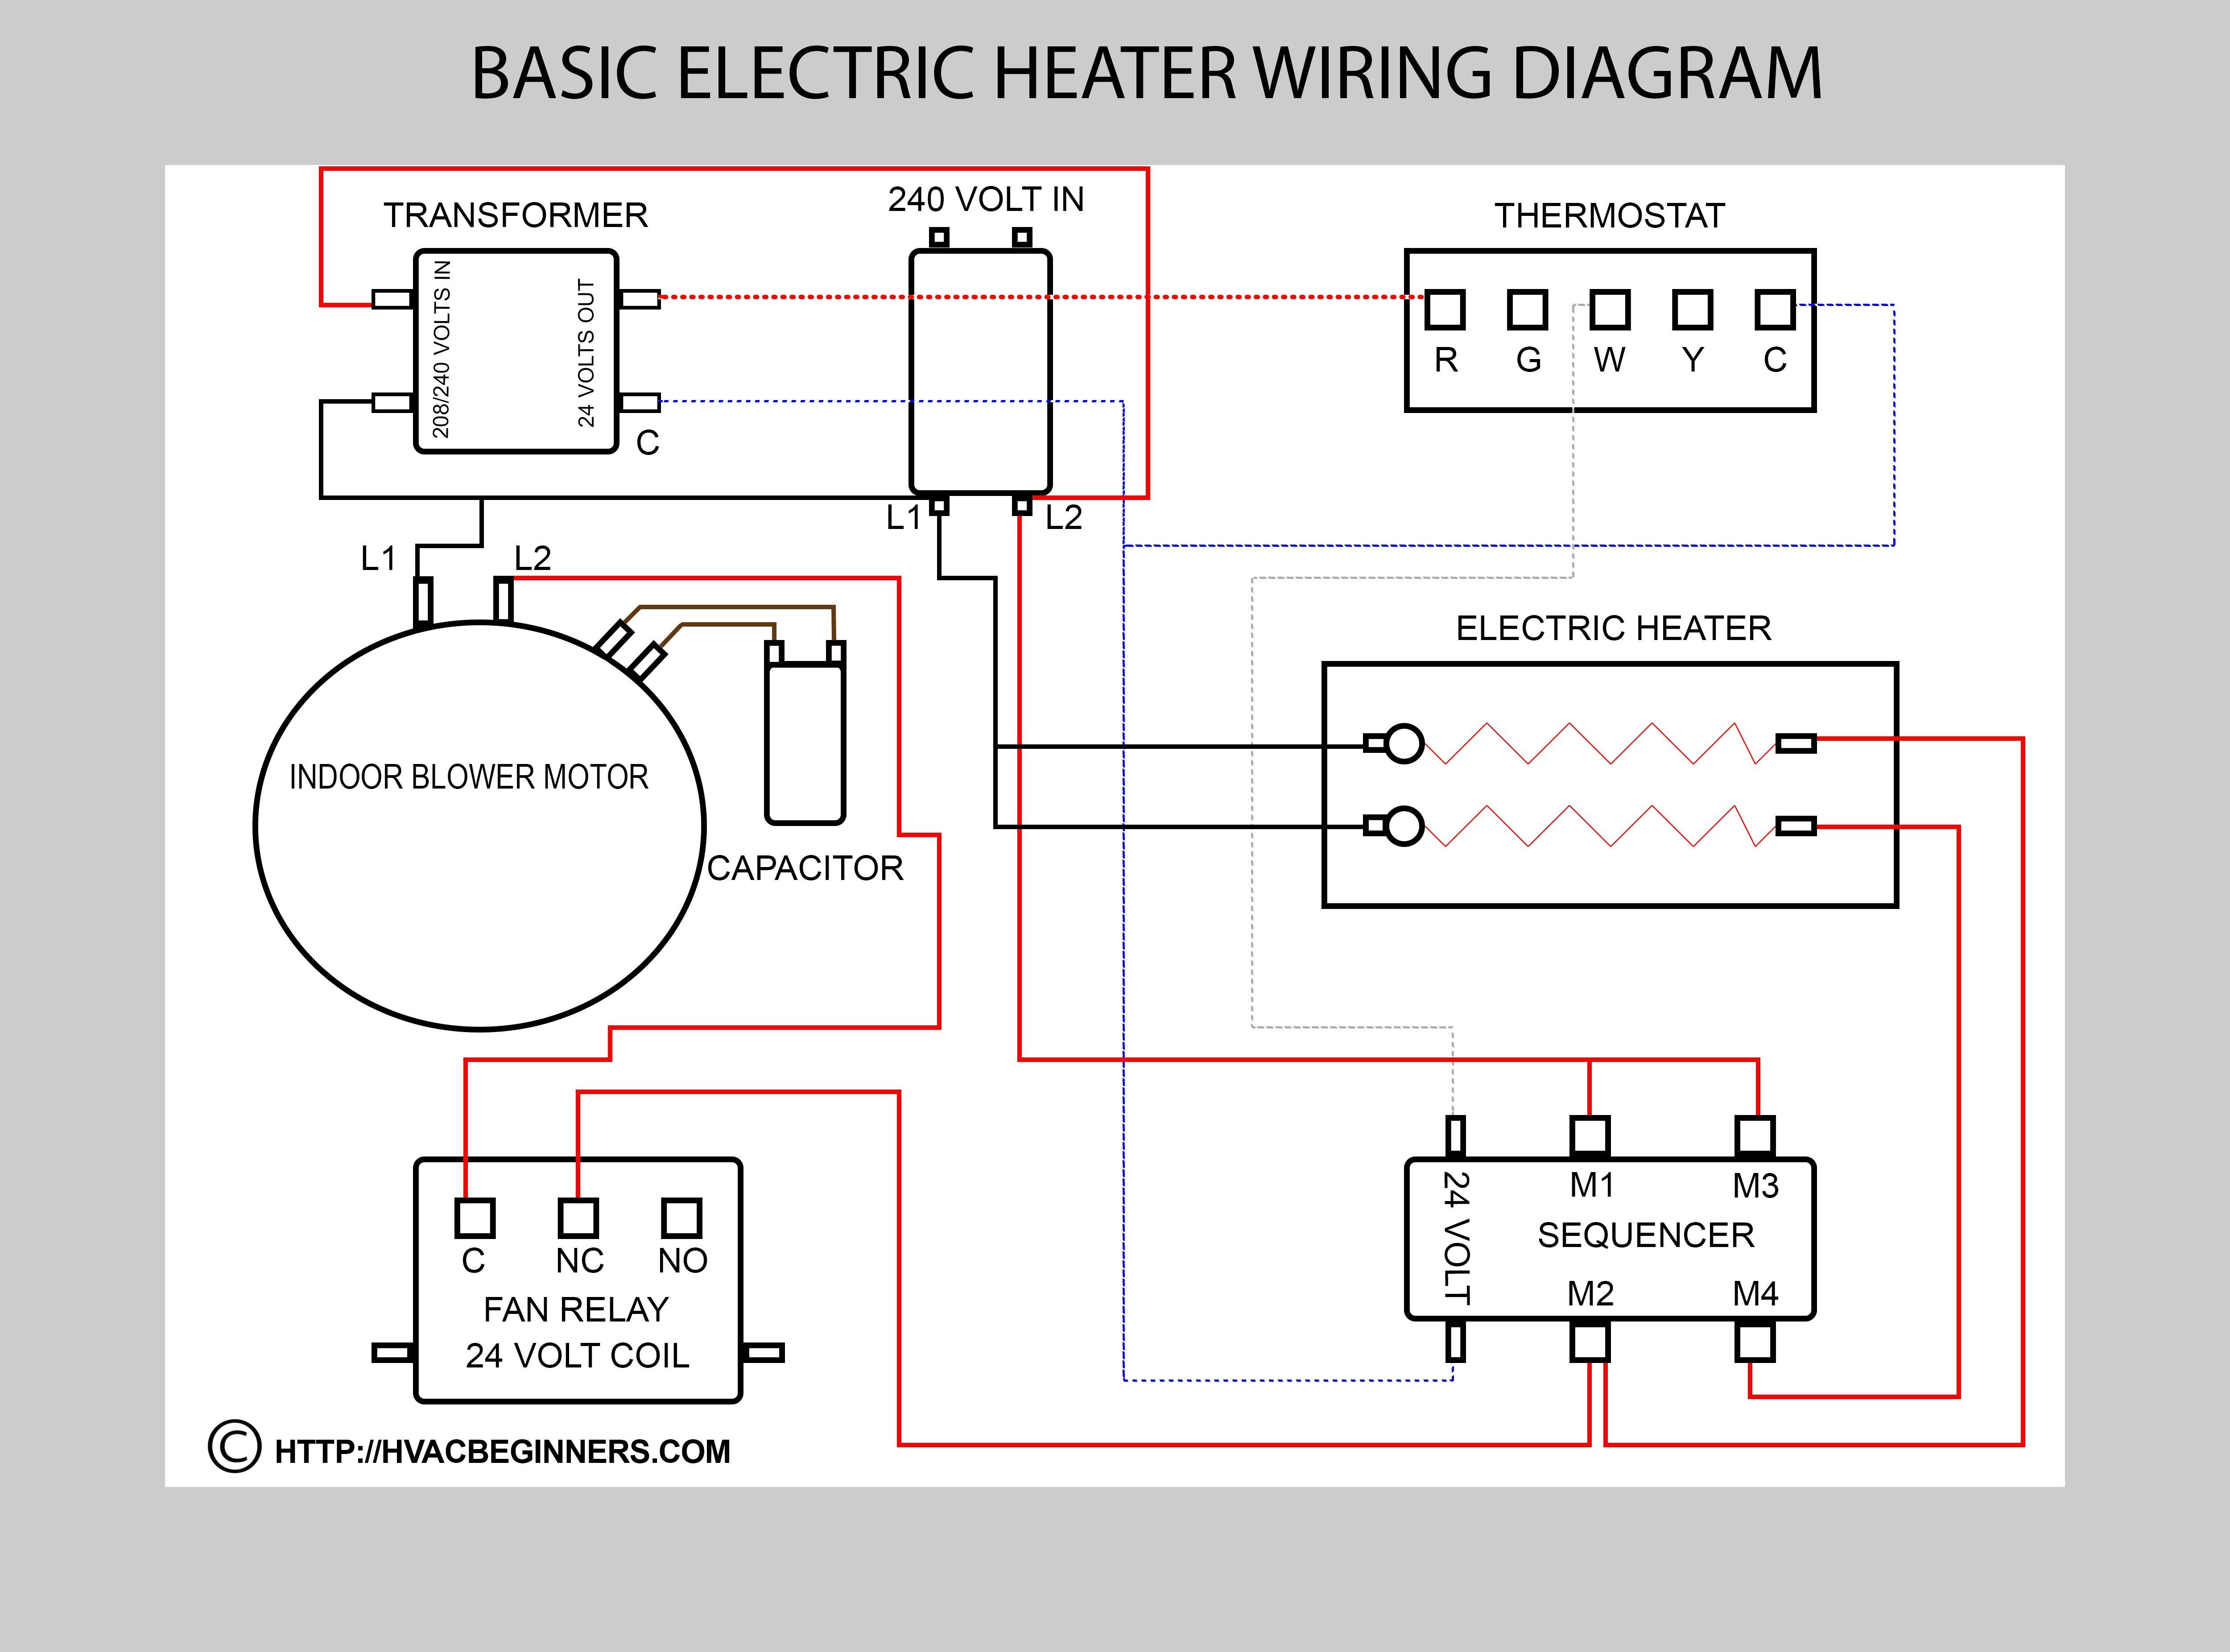 5 pin cdi box wiring diagram new heater relay wiring diagram wiring rh mmanews us 5 pin ac cdi box wiring diagram 5 Pin CDI Box for a 110Cc